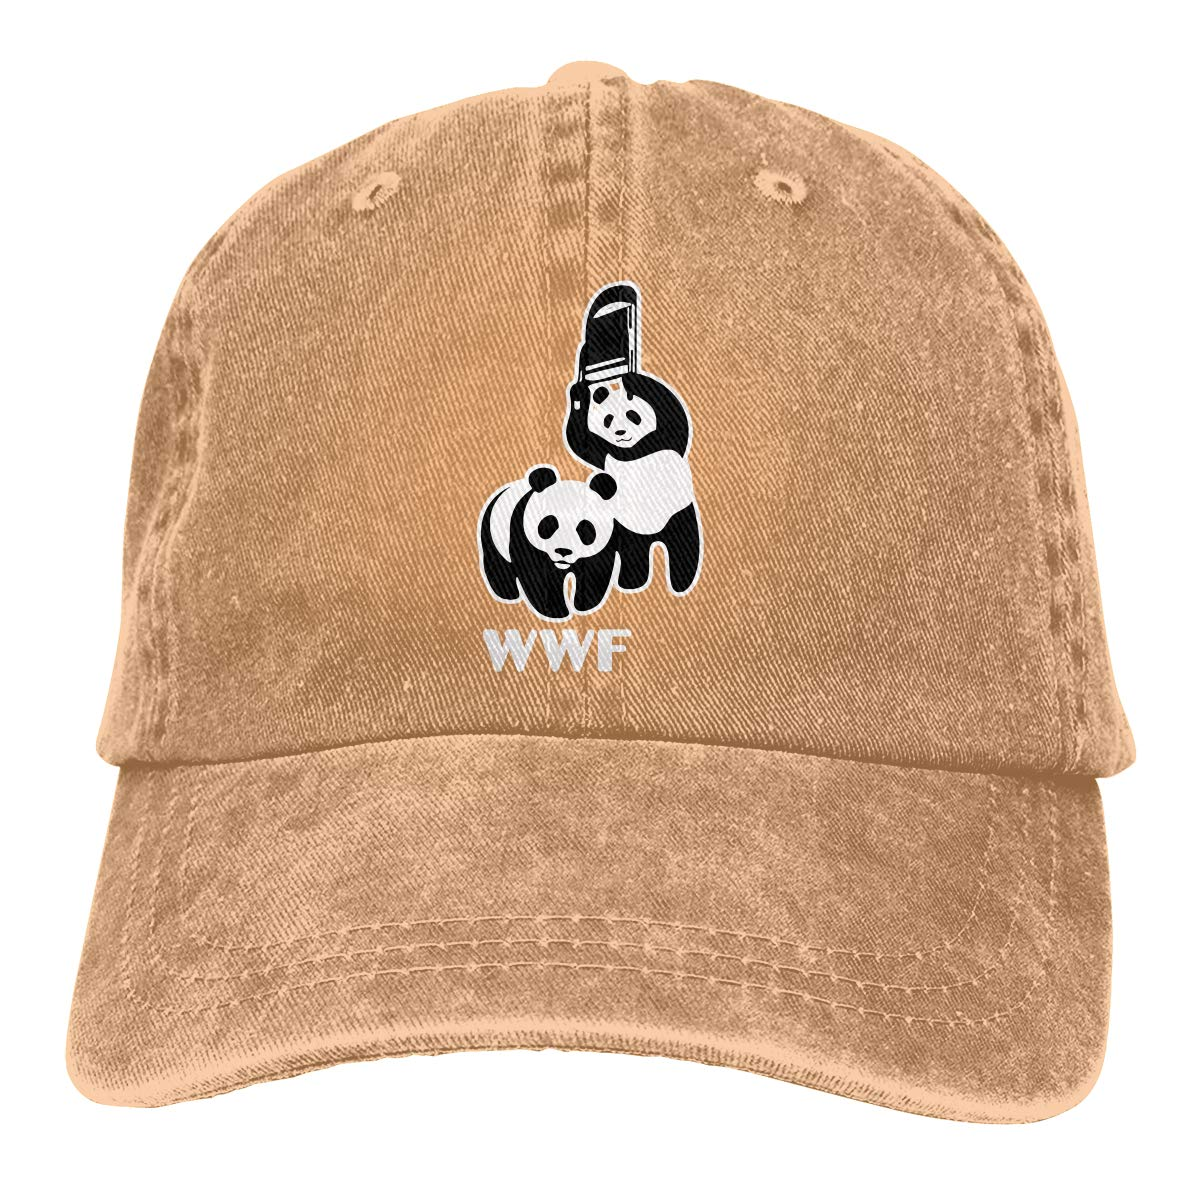 357390afea9 Wwf panda bear wrestling adjustable baseball caps denim hats cowboy sport  outdoor at amazon men clothing